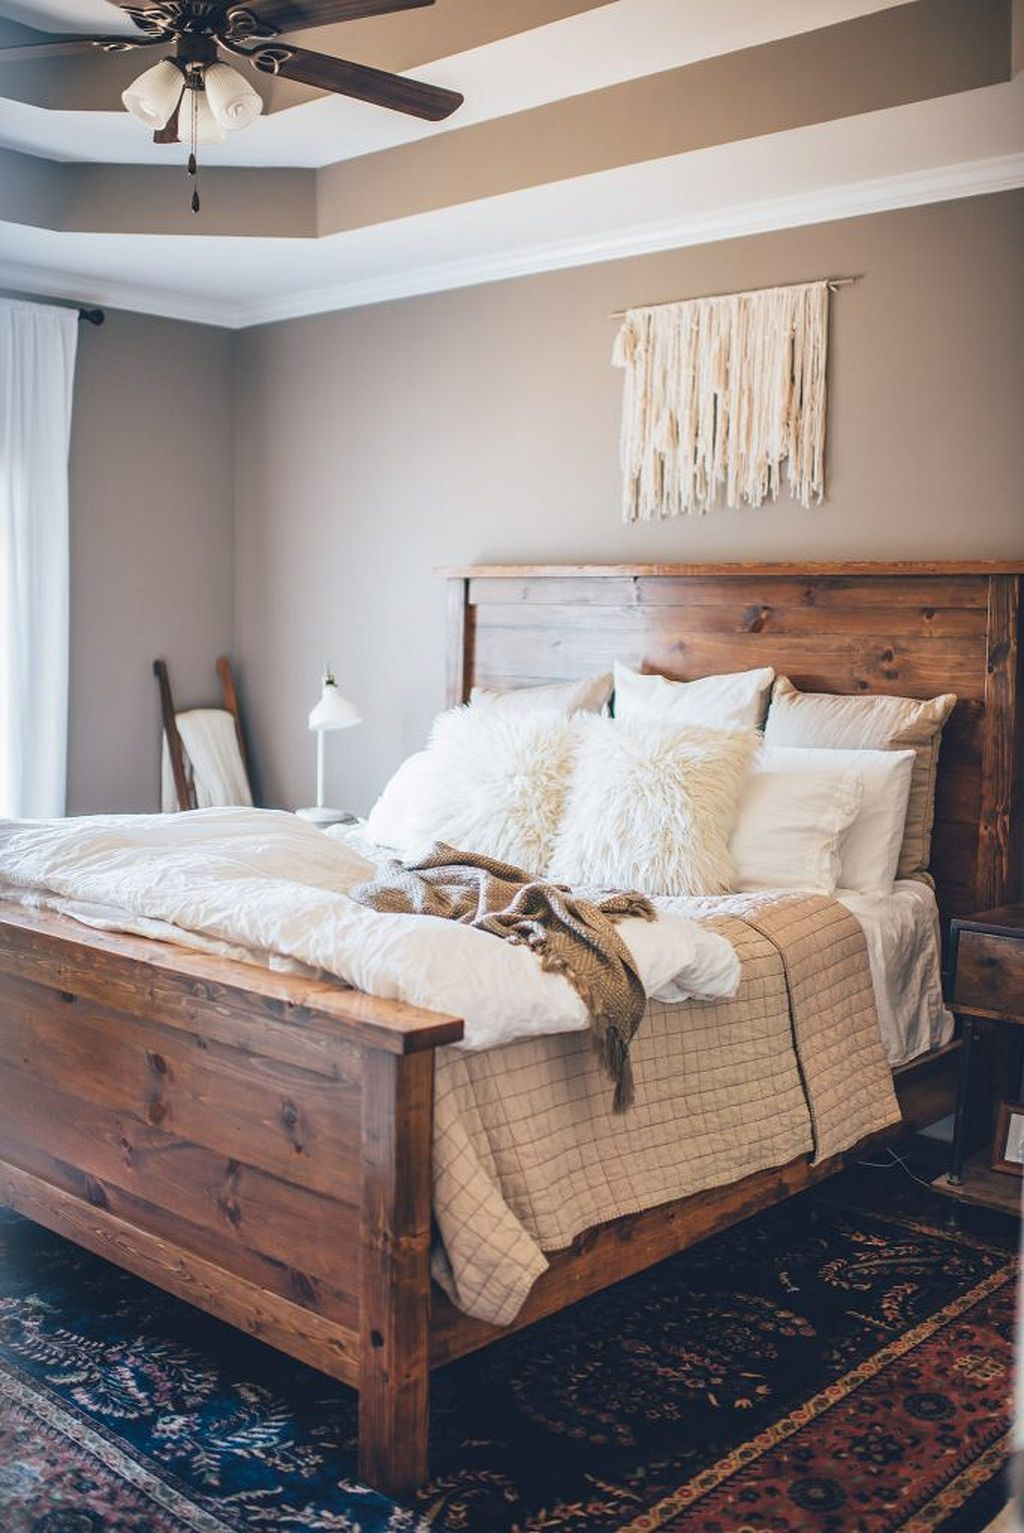 50 Rustic Master Bedroom Ideas 35 50